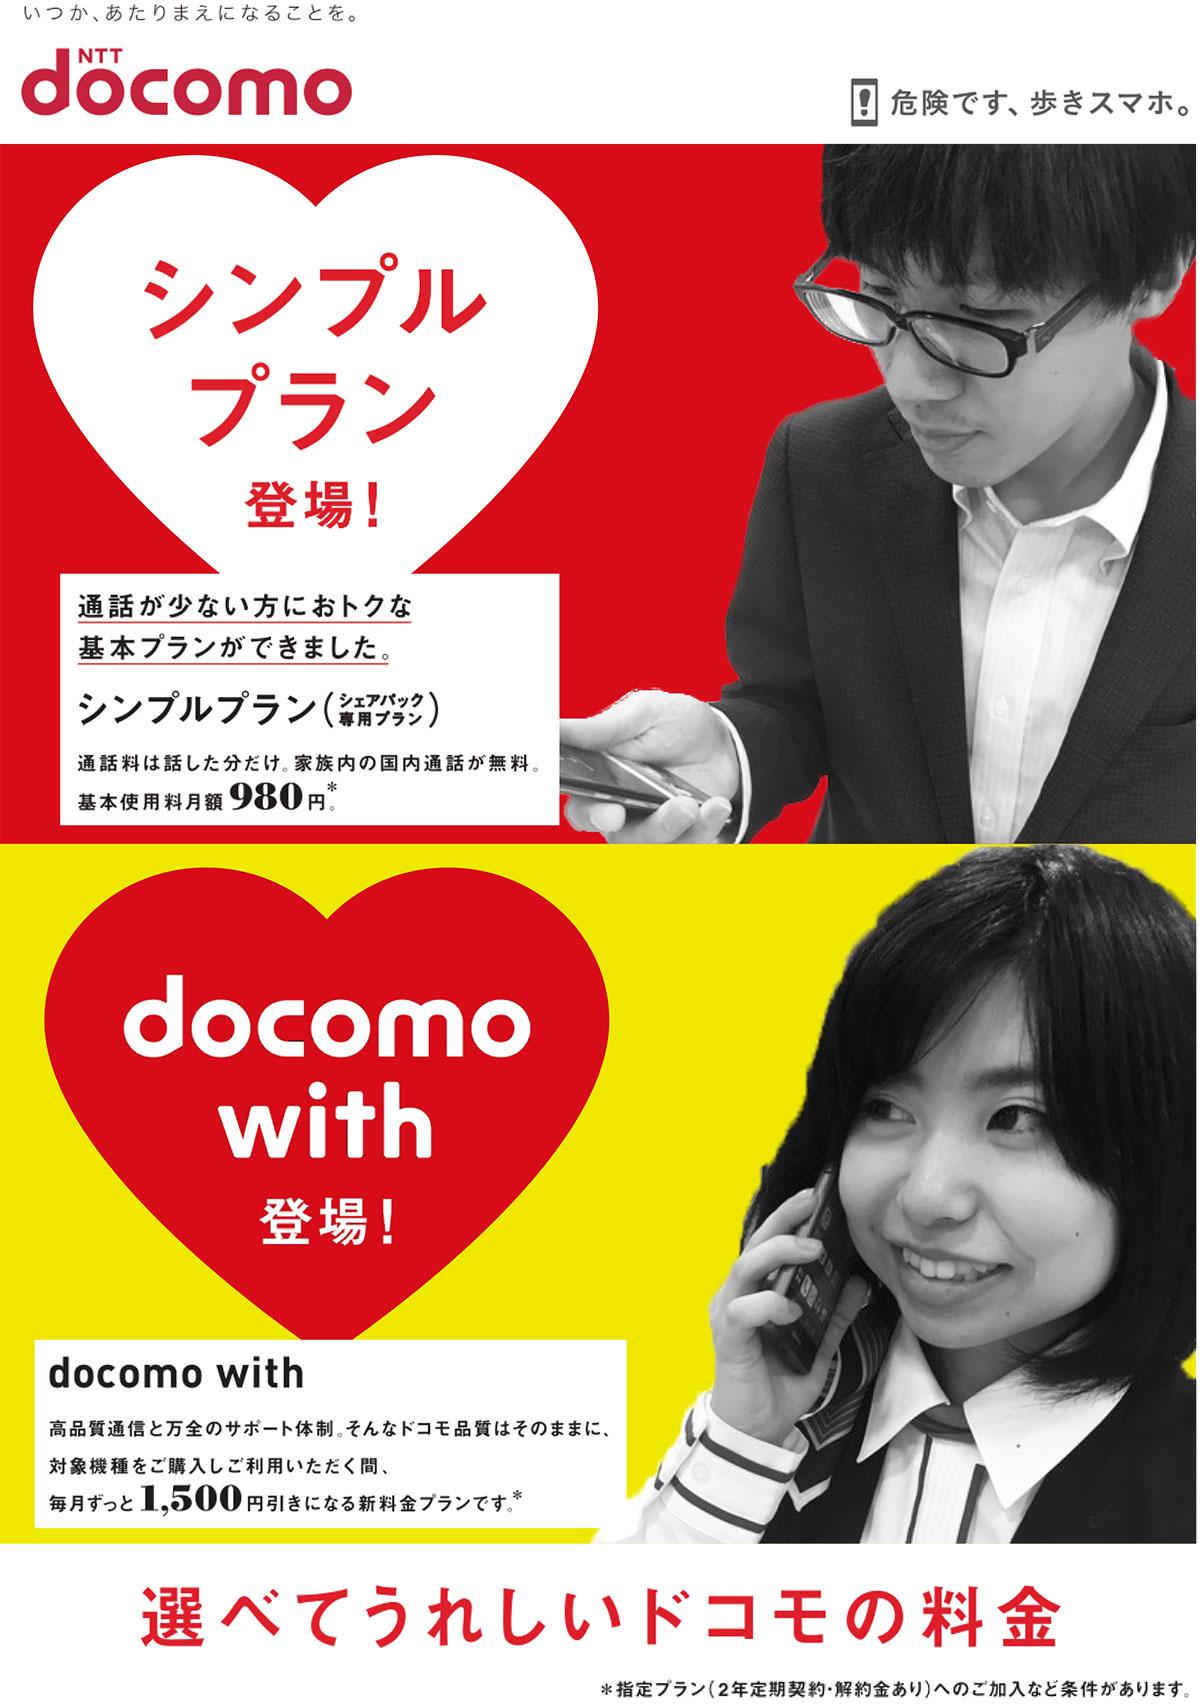 http://www.odori-bisse.com/info/up_images/docomo_170711_img.jpg